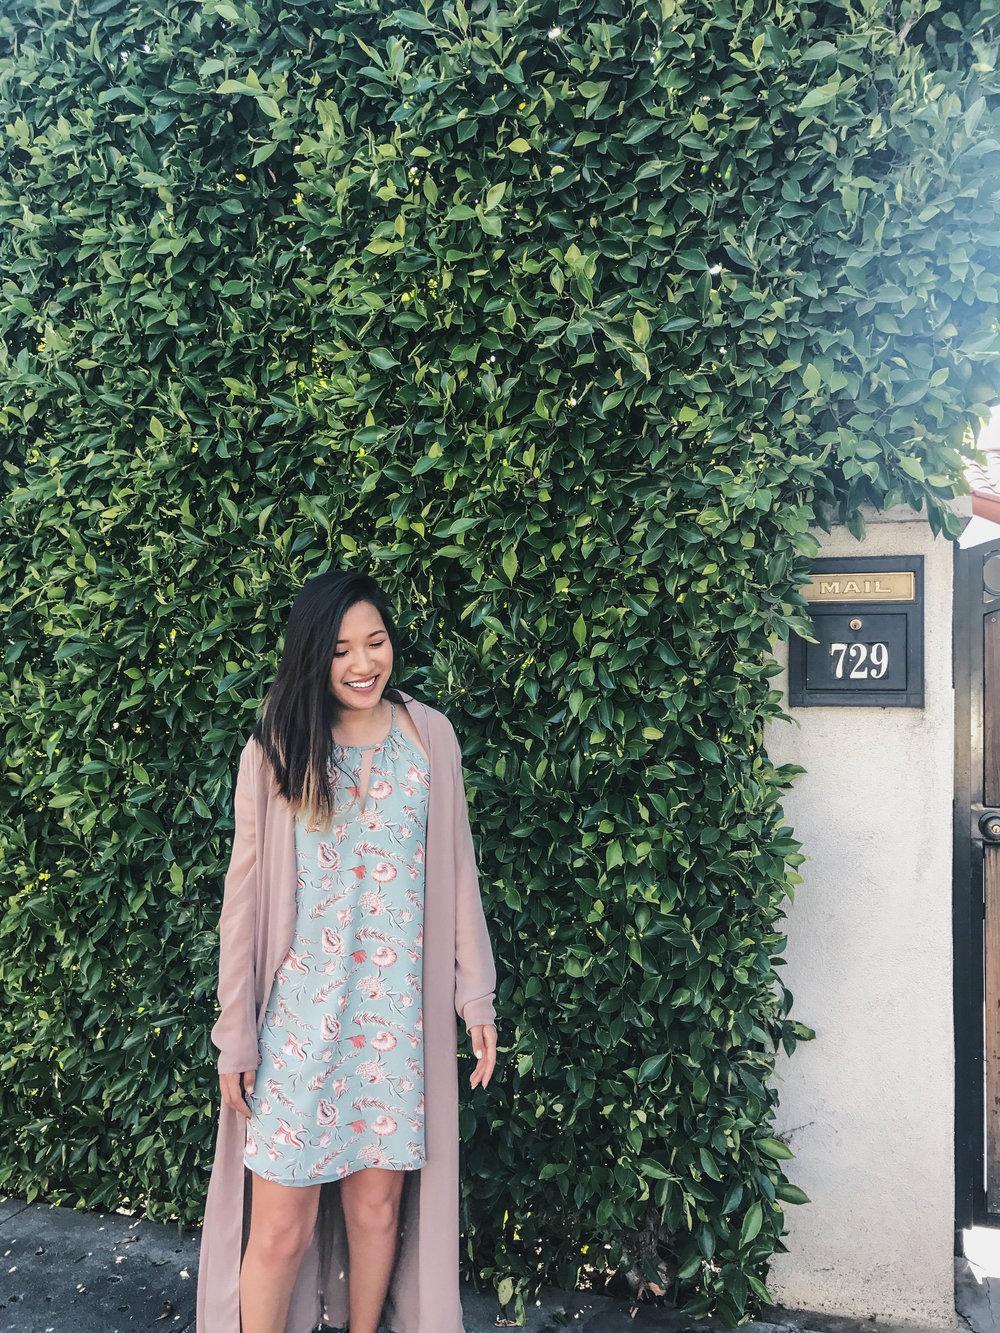 Irene Shim: A Vibrant Los Angeles Style 4